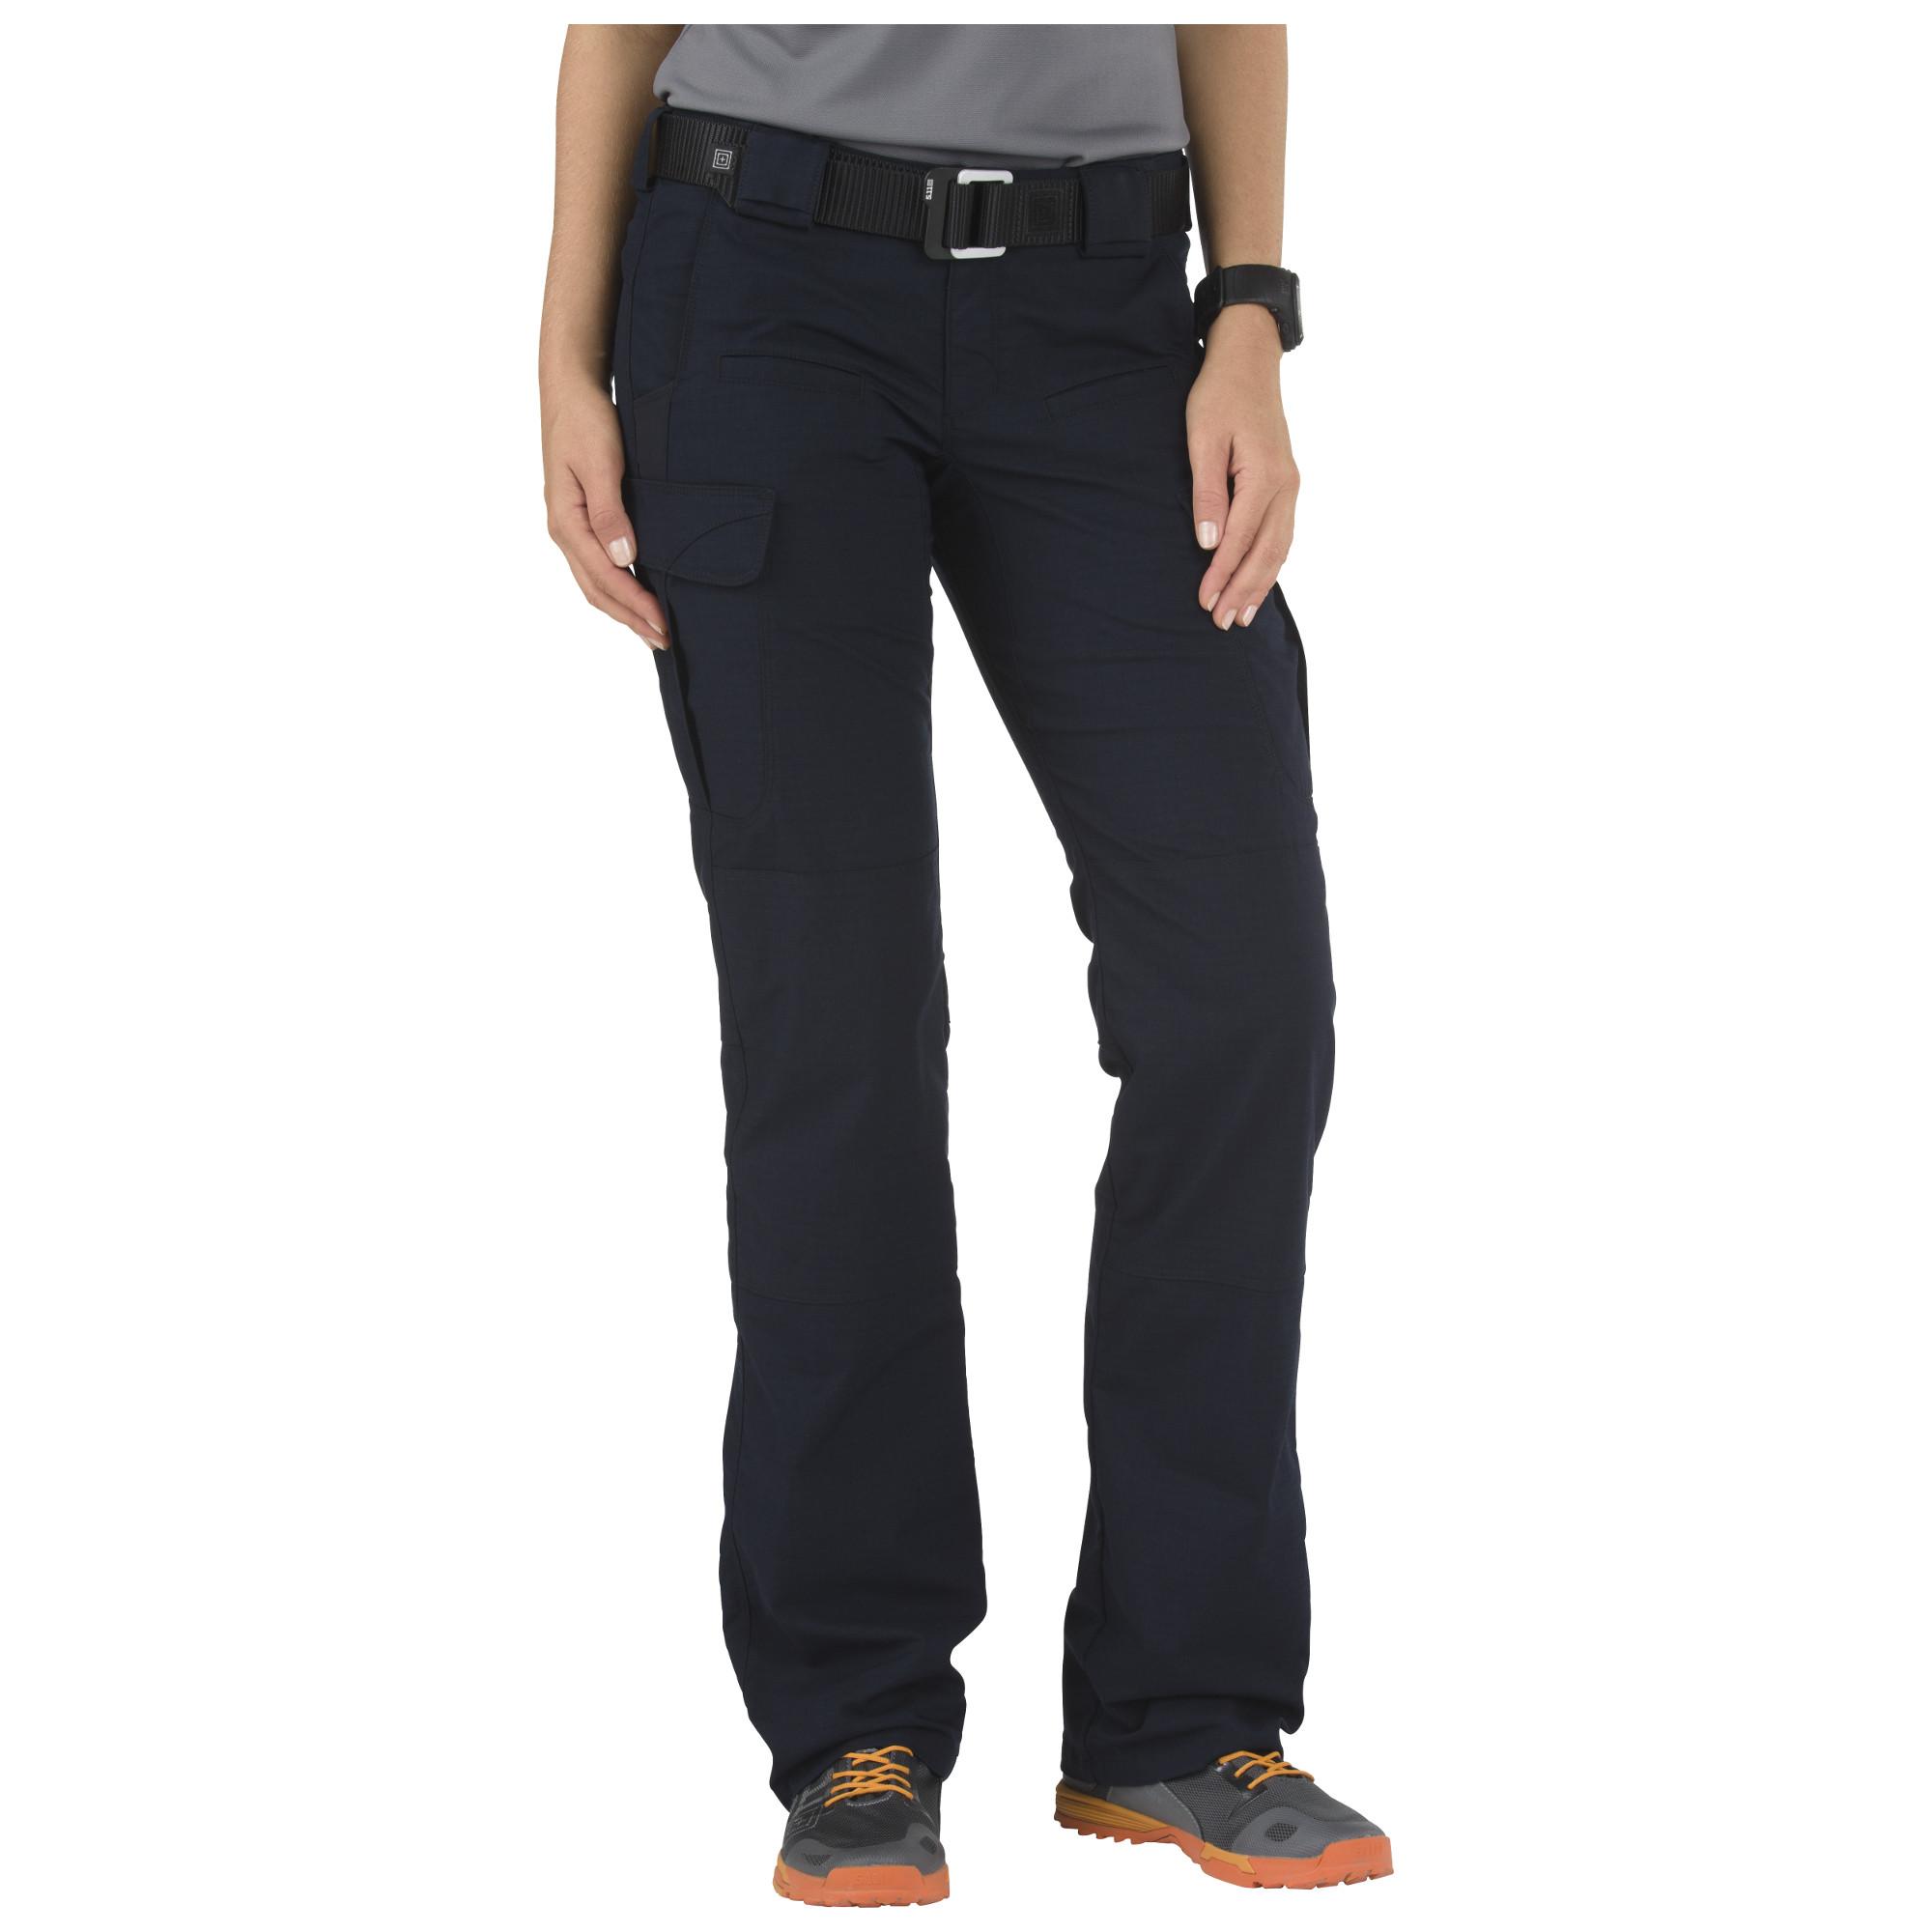 Pantalon 5 11 Tactical Stryke De Mujer Alcatraz